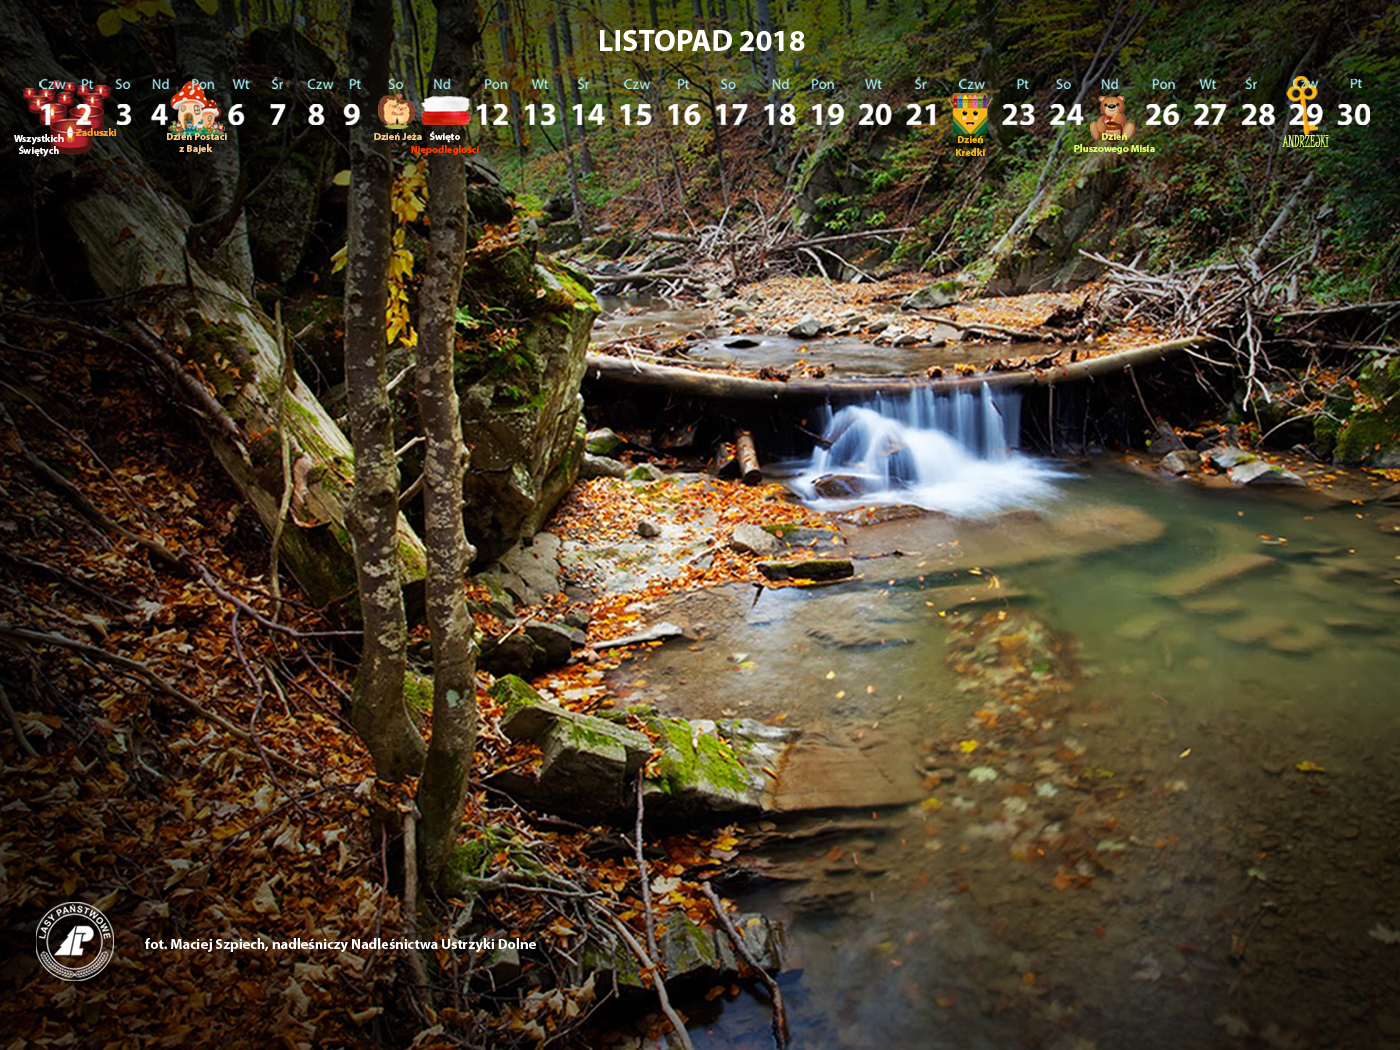 Kalendarz_listopad_2018_1400x1050[1].jpg